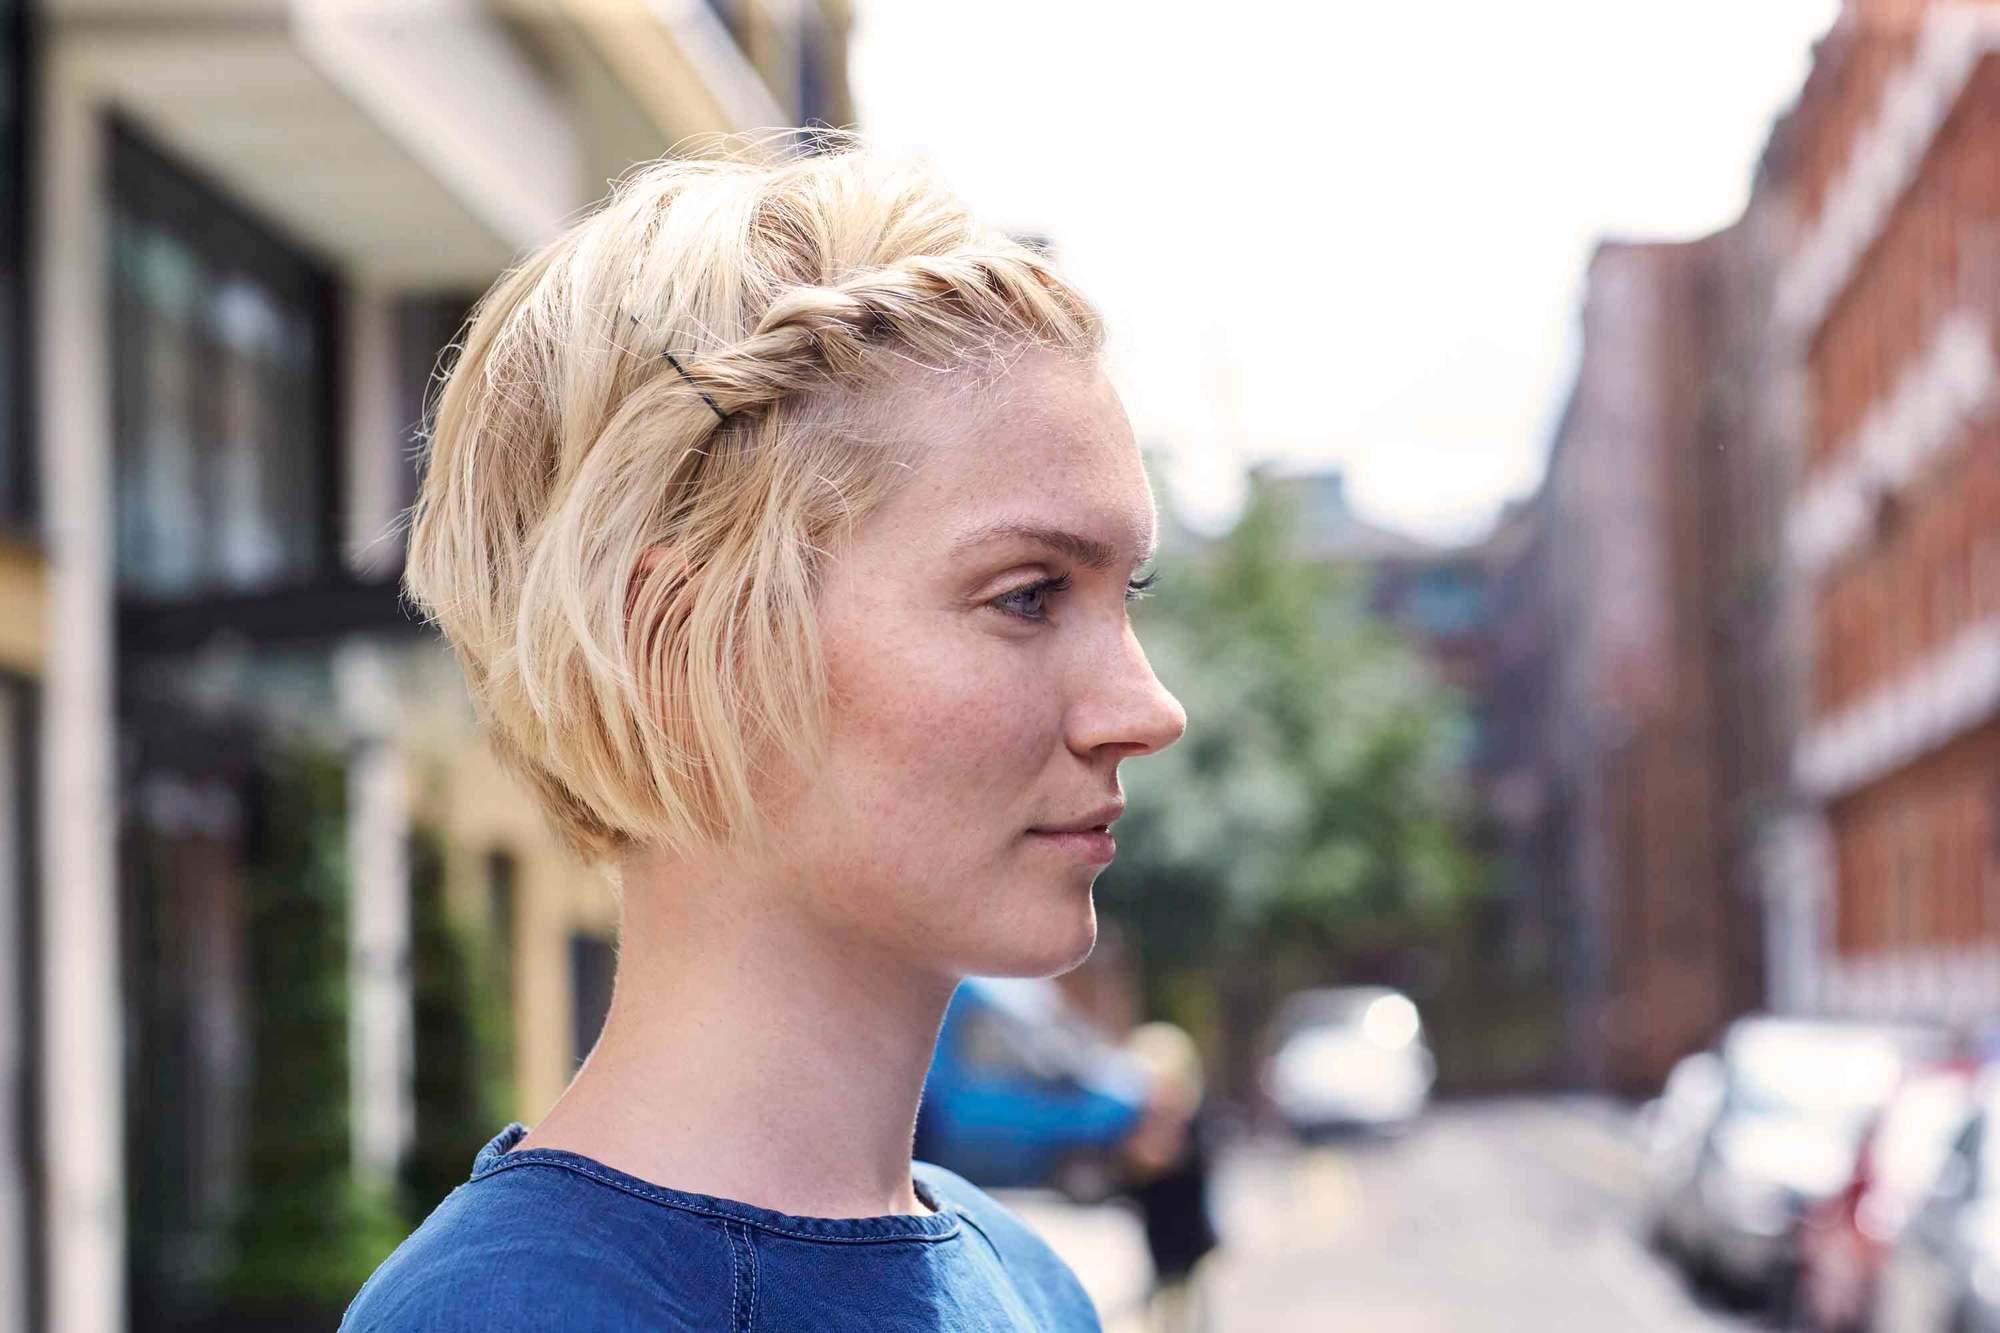 how to braid bangs: Twist hairstyle on blonde hair